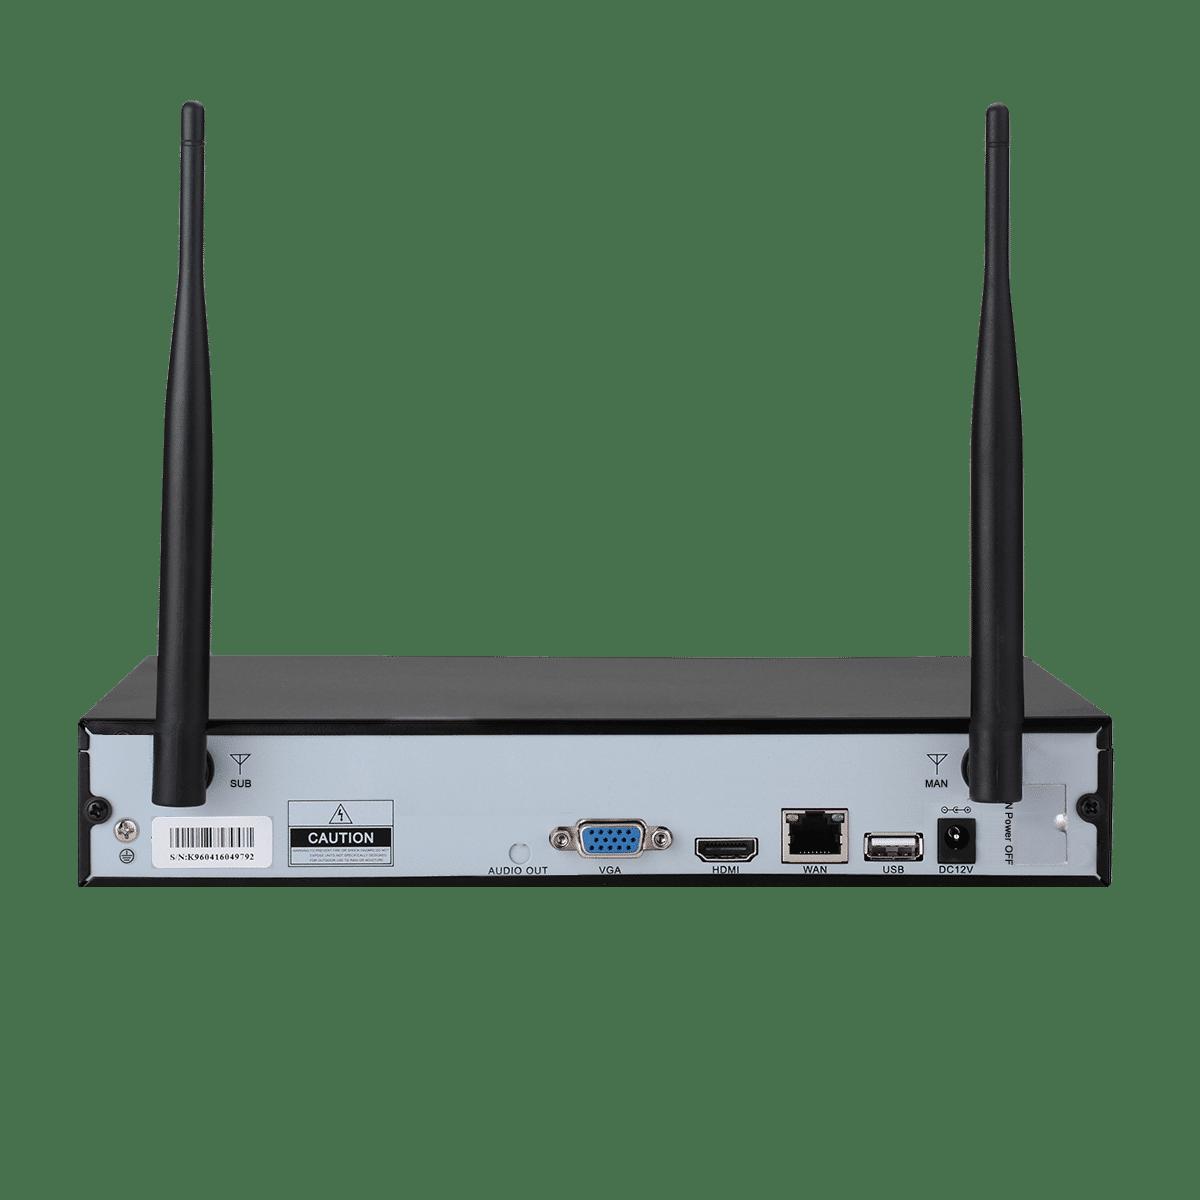 WNK803 ipcamera kit 4